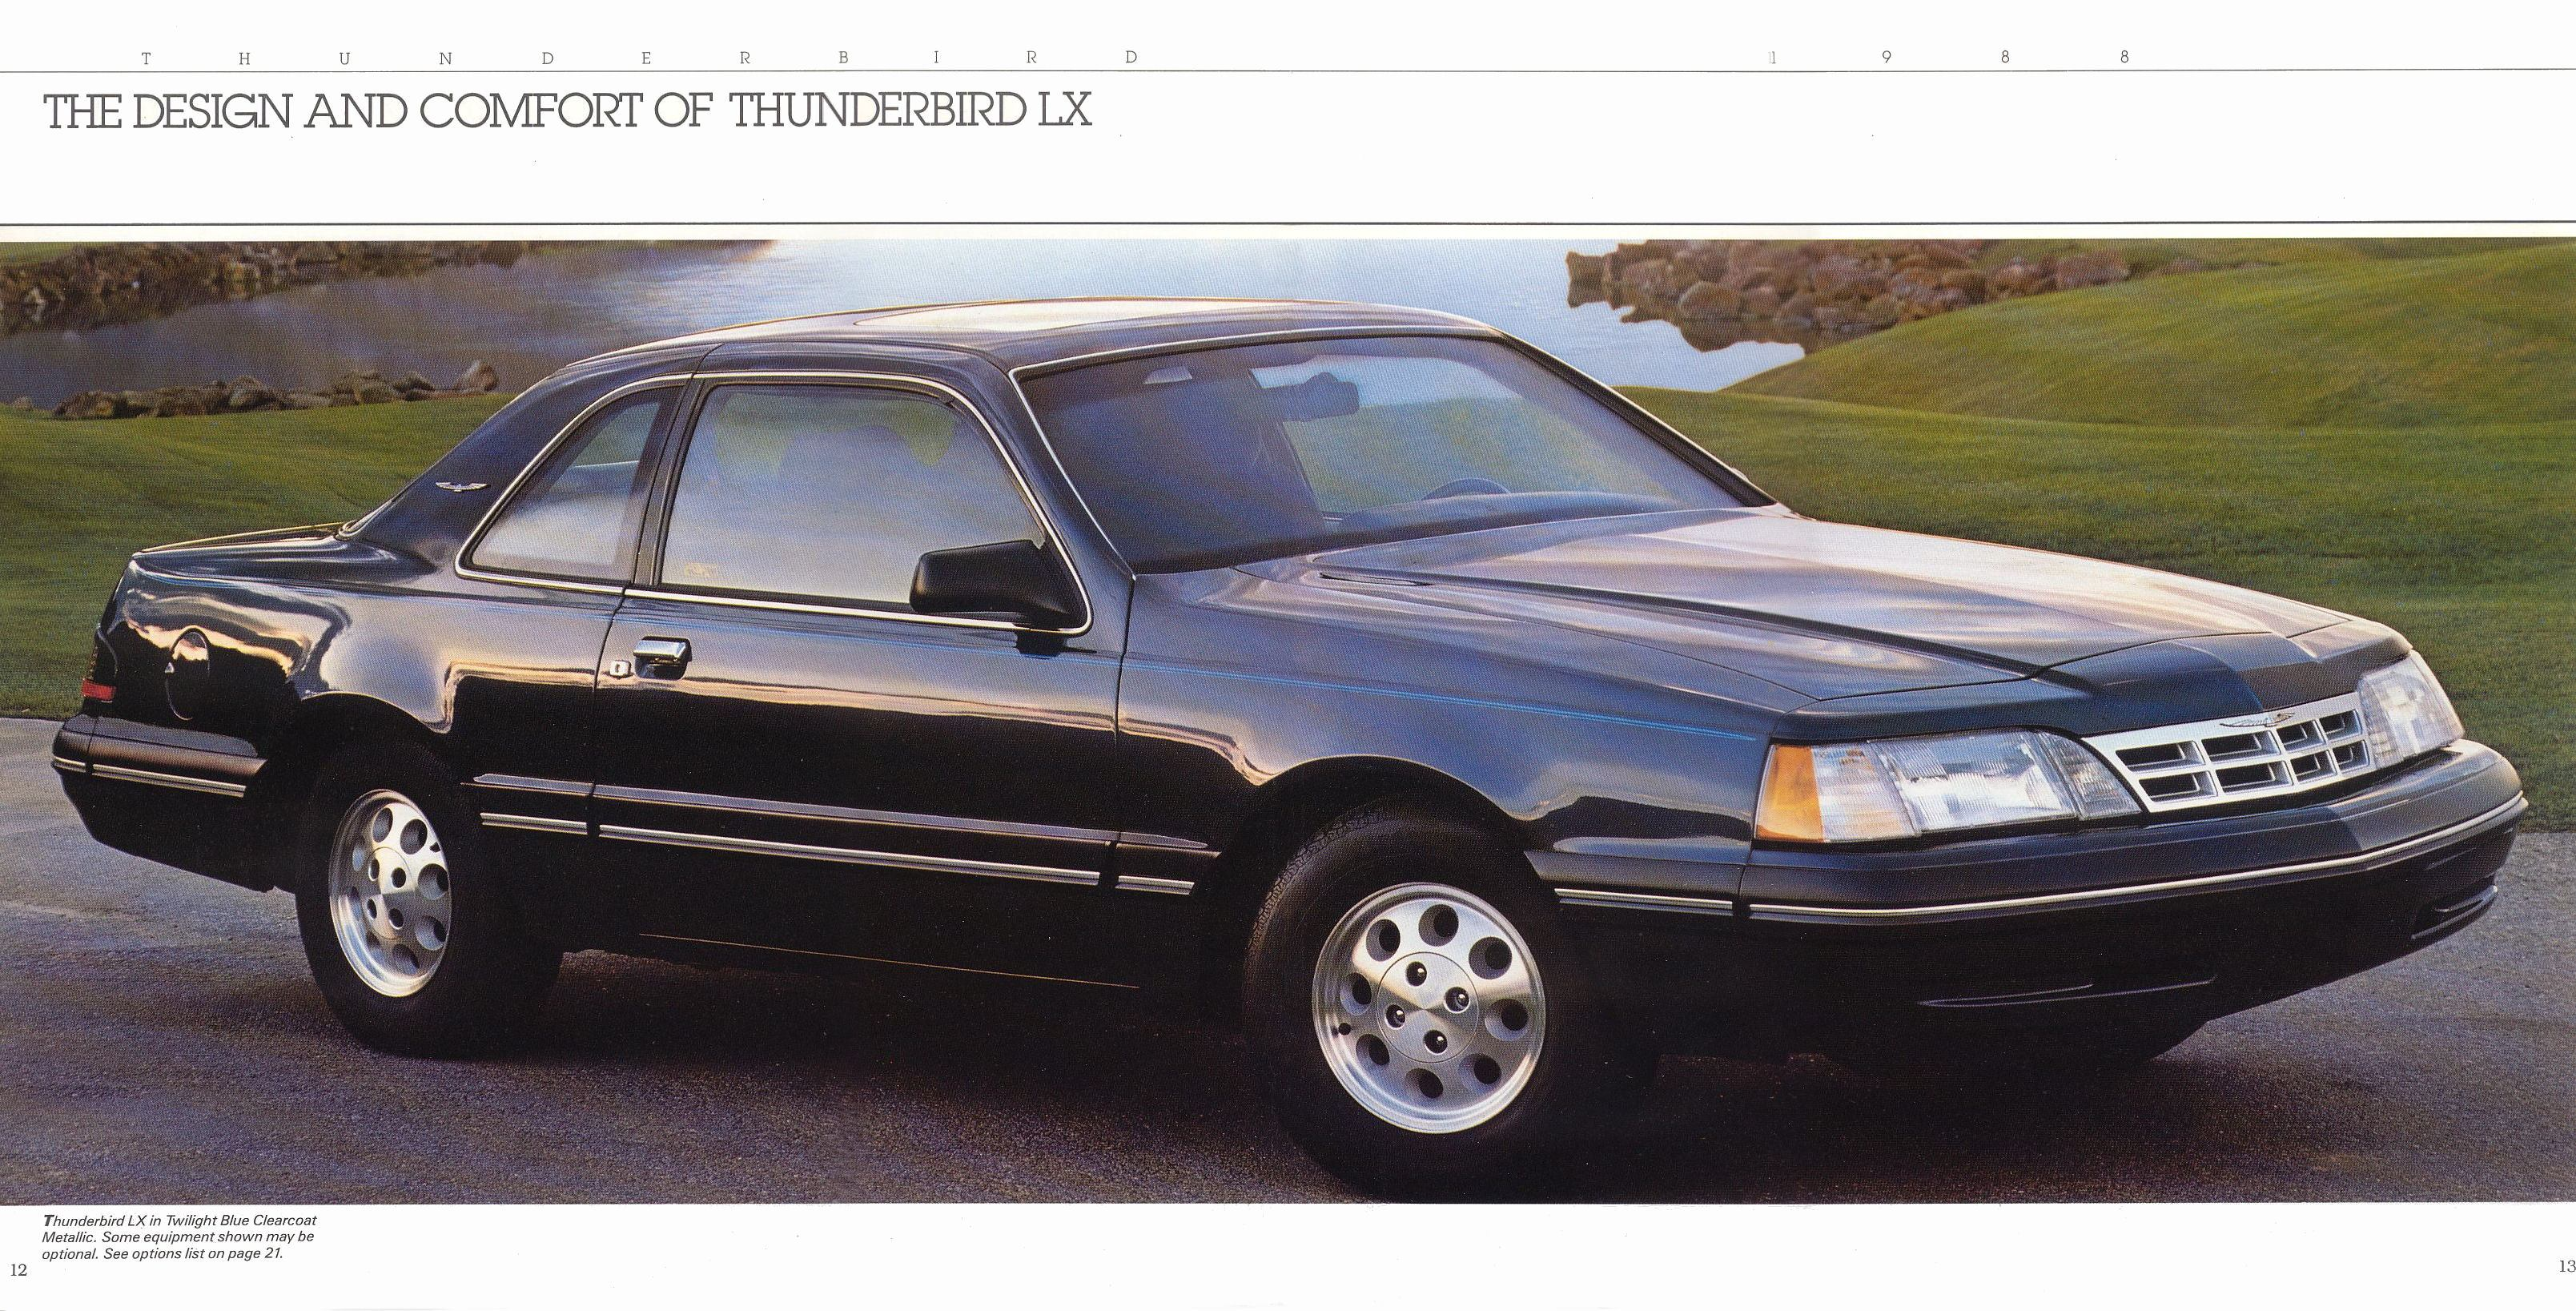 1988 Ford Thunderbird brochure